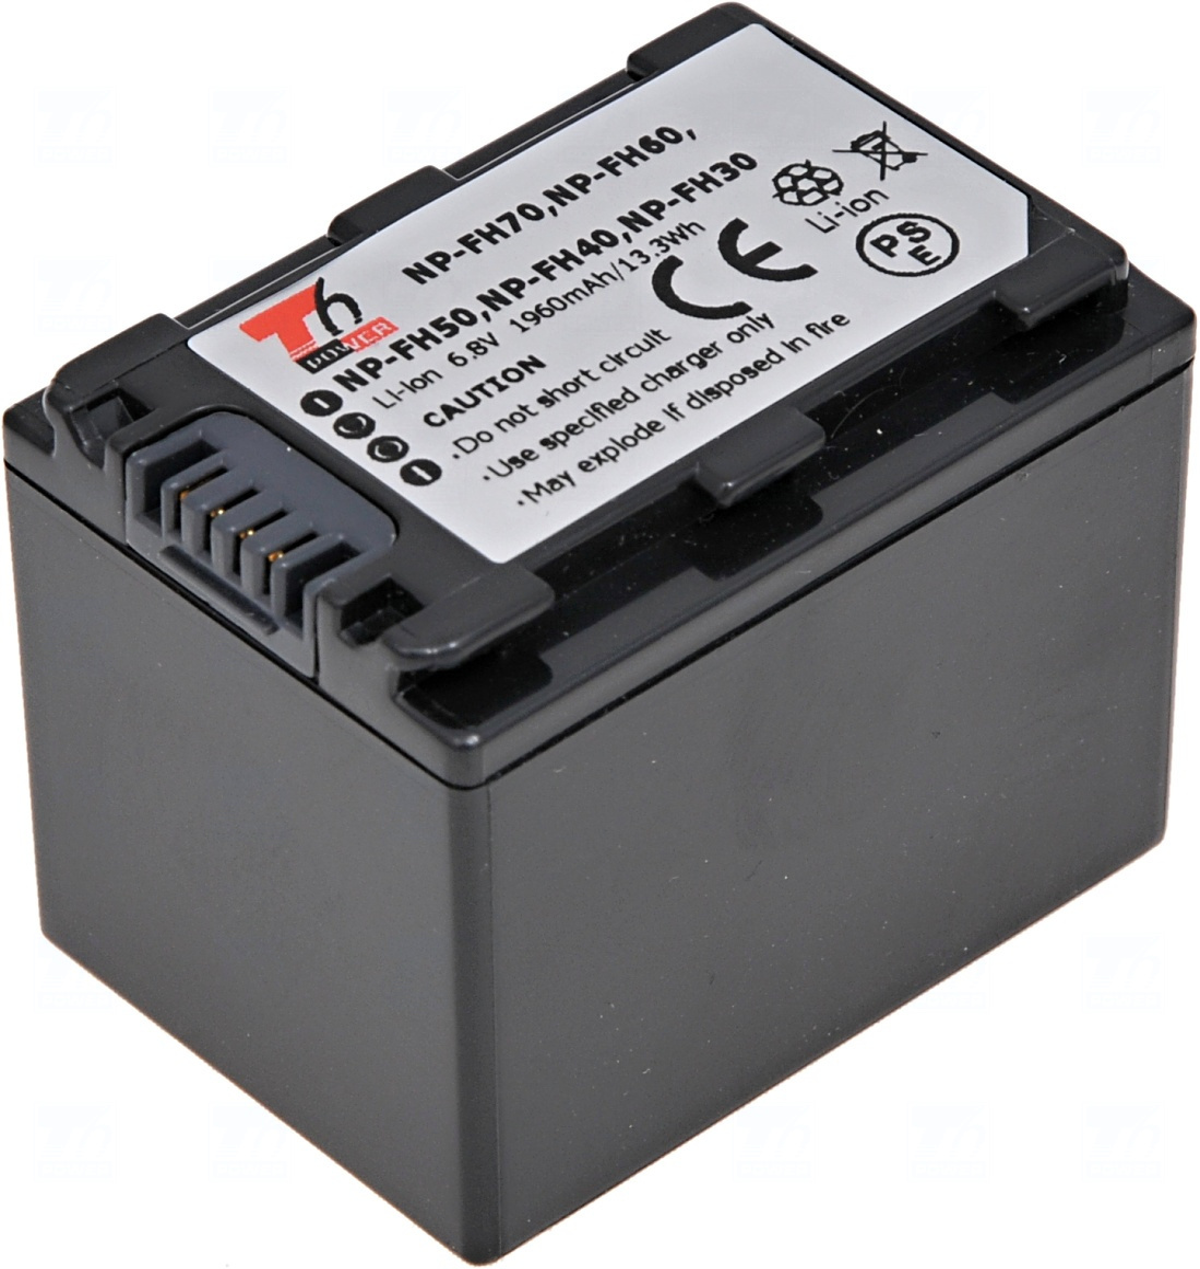 Baterie T6 power NP-FH30, NP-FH40, NP-FH50, NP-FH60, NP-FH70